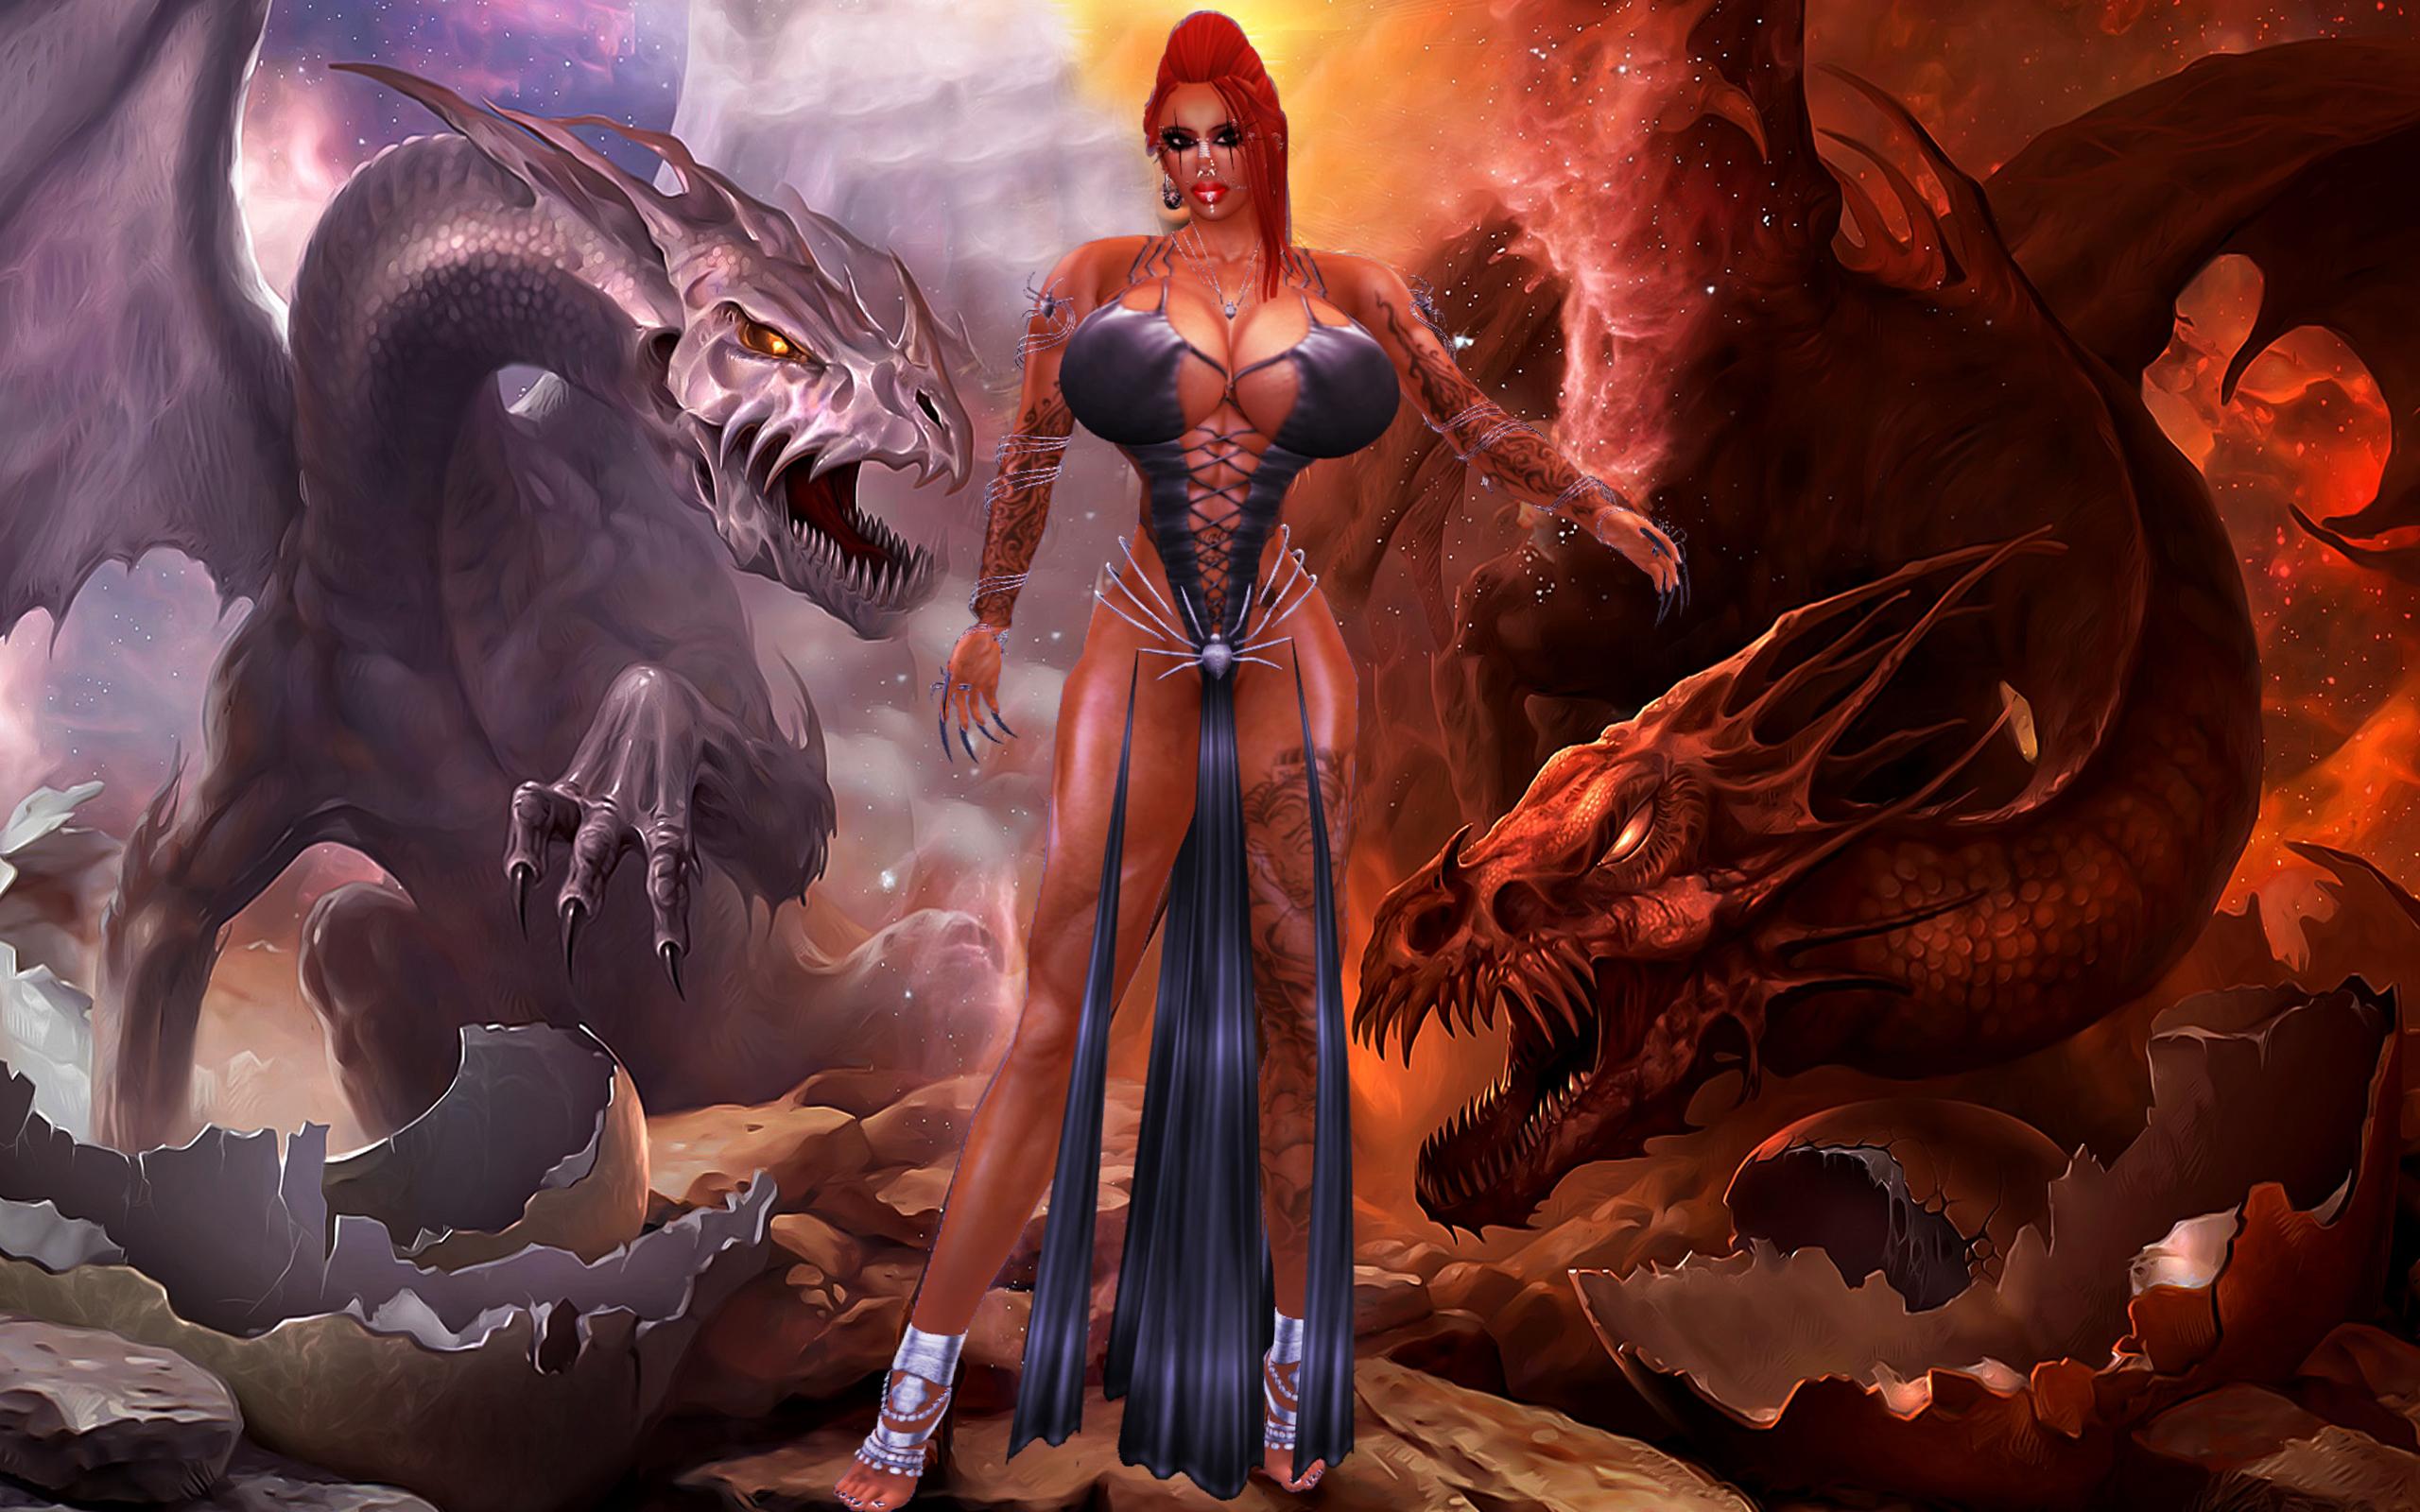 Wallpaper  Sexy, Erotic, Muscular, Dragons, Fantasy, Secondlife, Diablo, Hugetits -4604